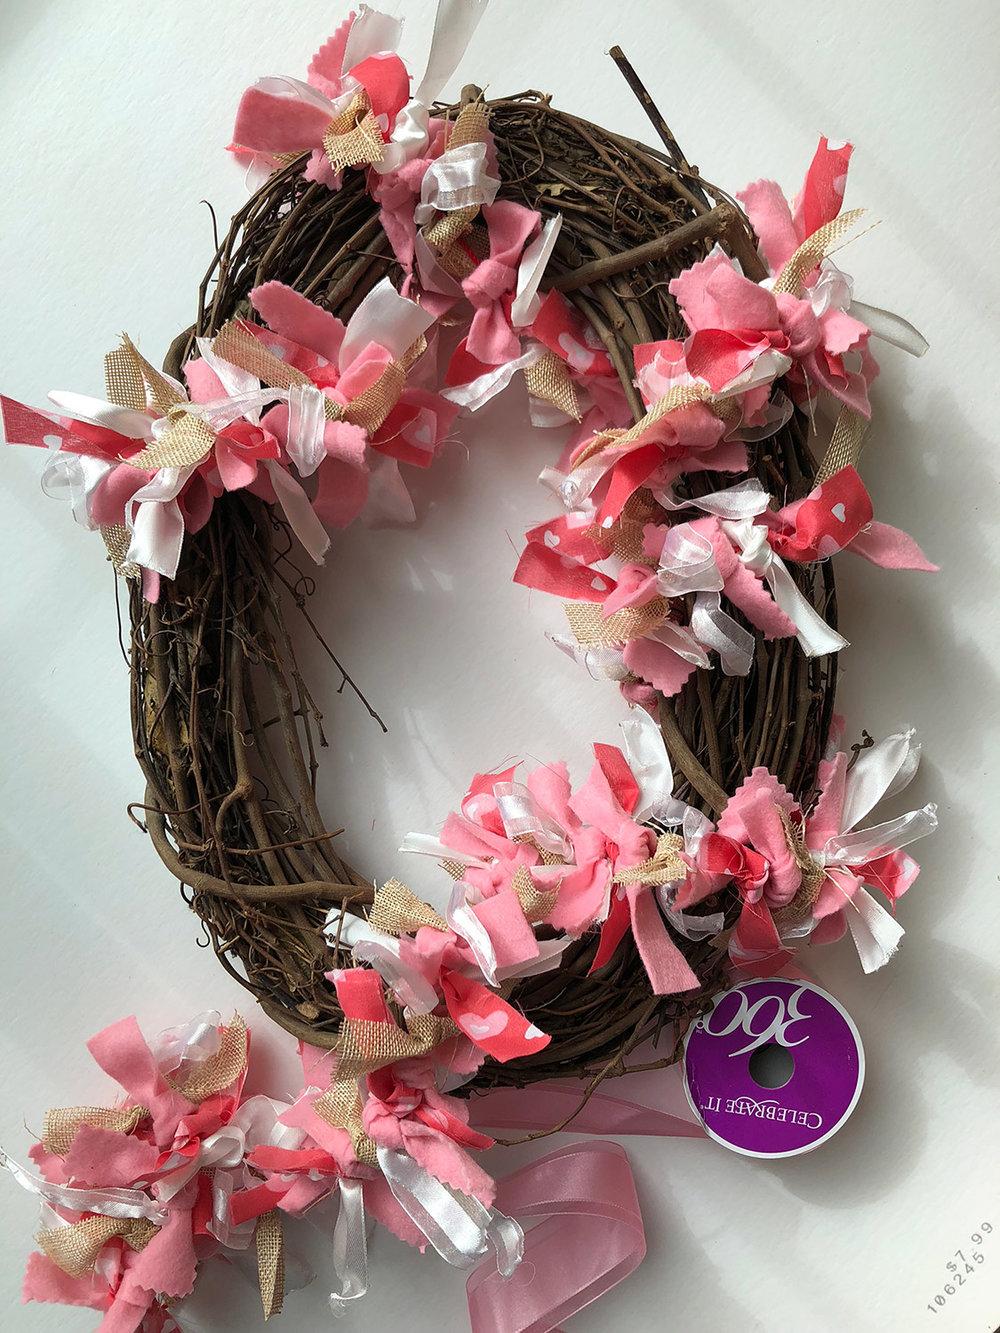 DIY grapevine ribbon wreath in progress